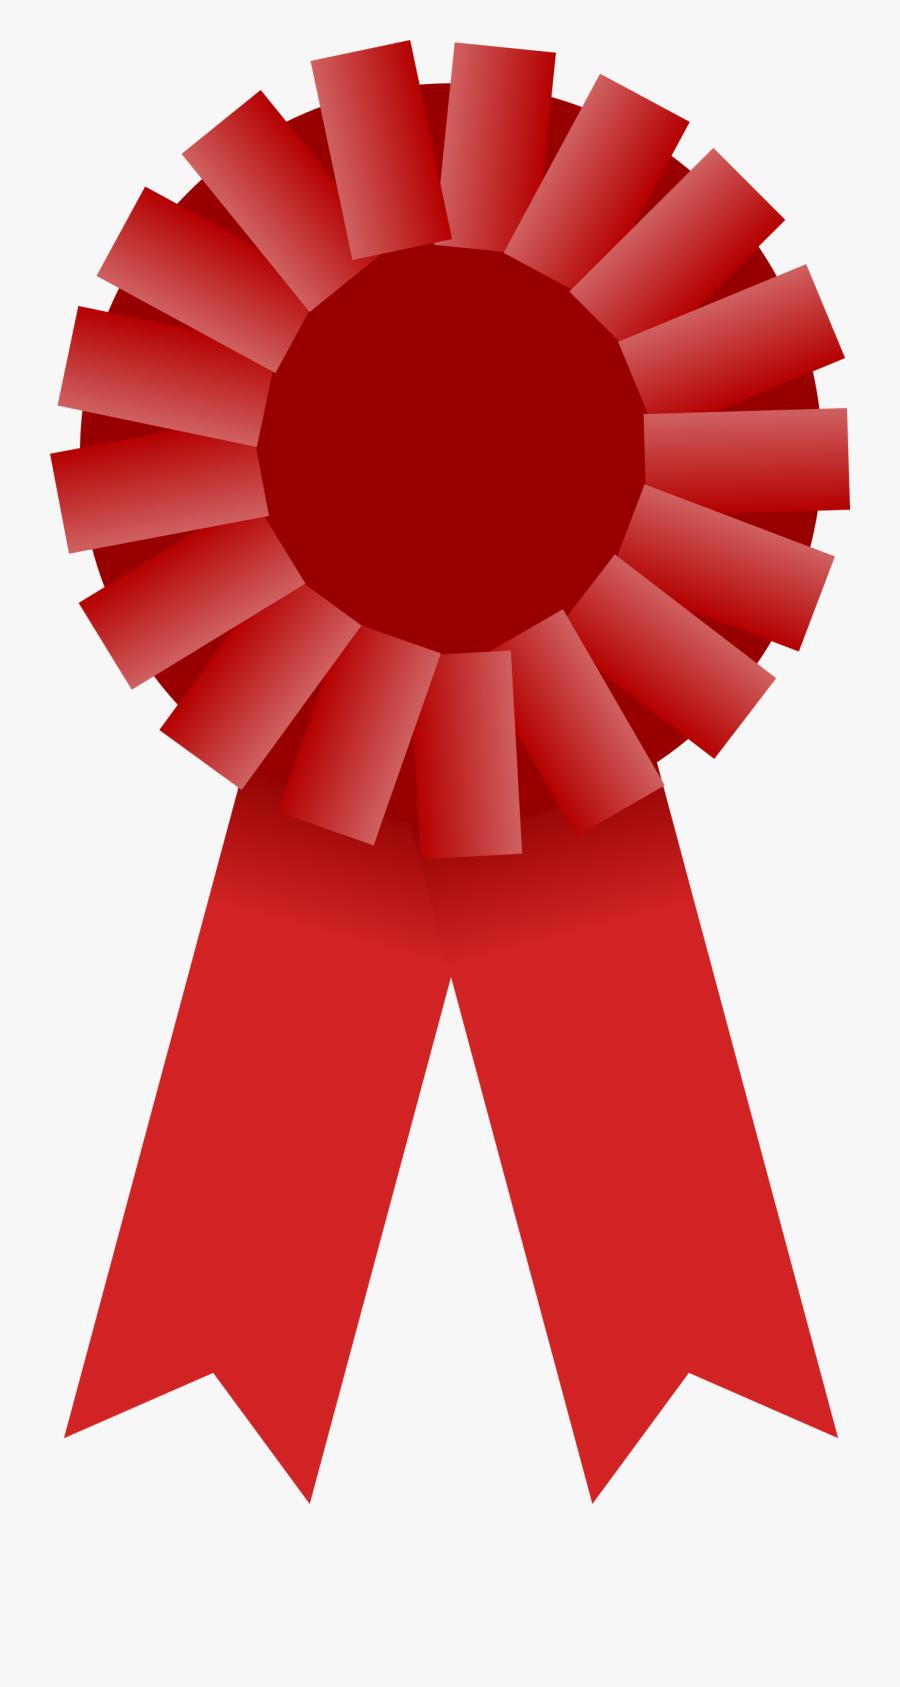 Clip Art Prize Ribbon - Award Ribbon Clipart Red, Transparent Clipart